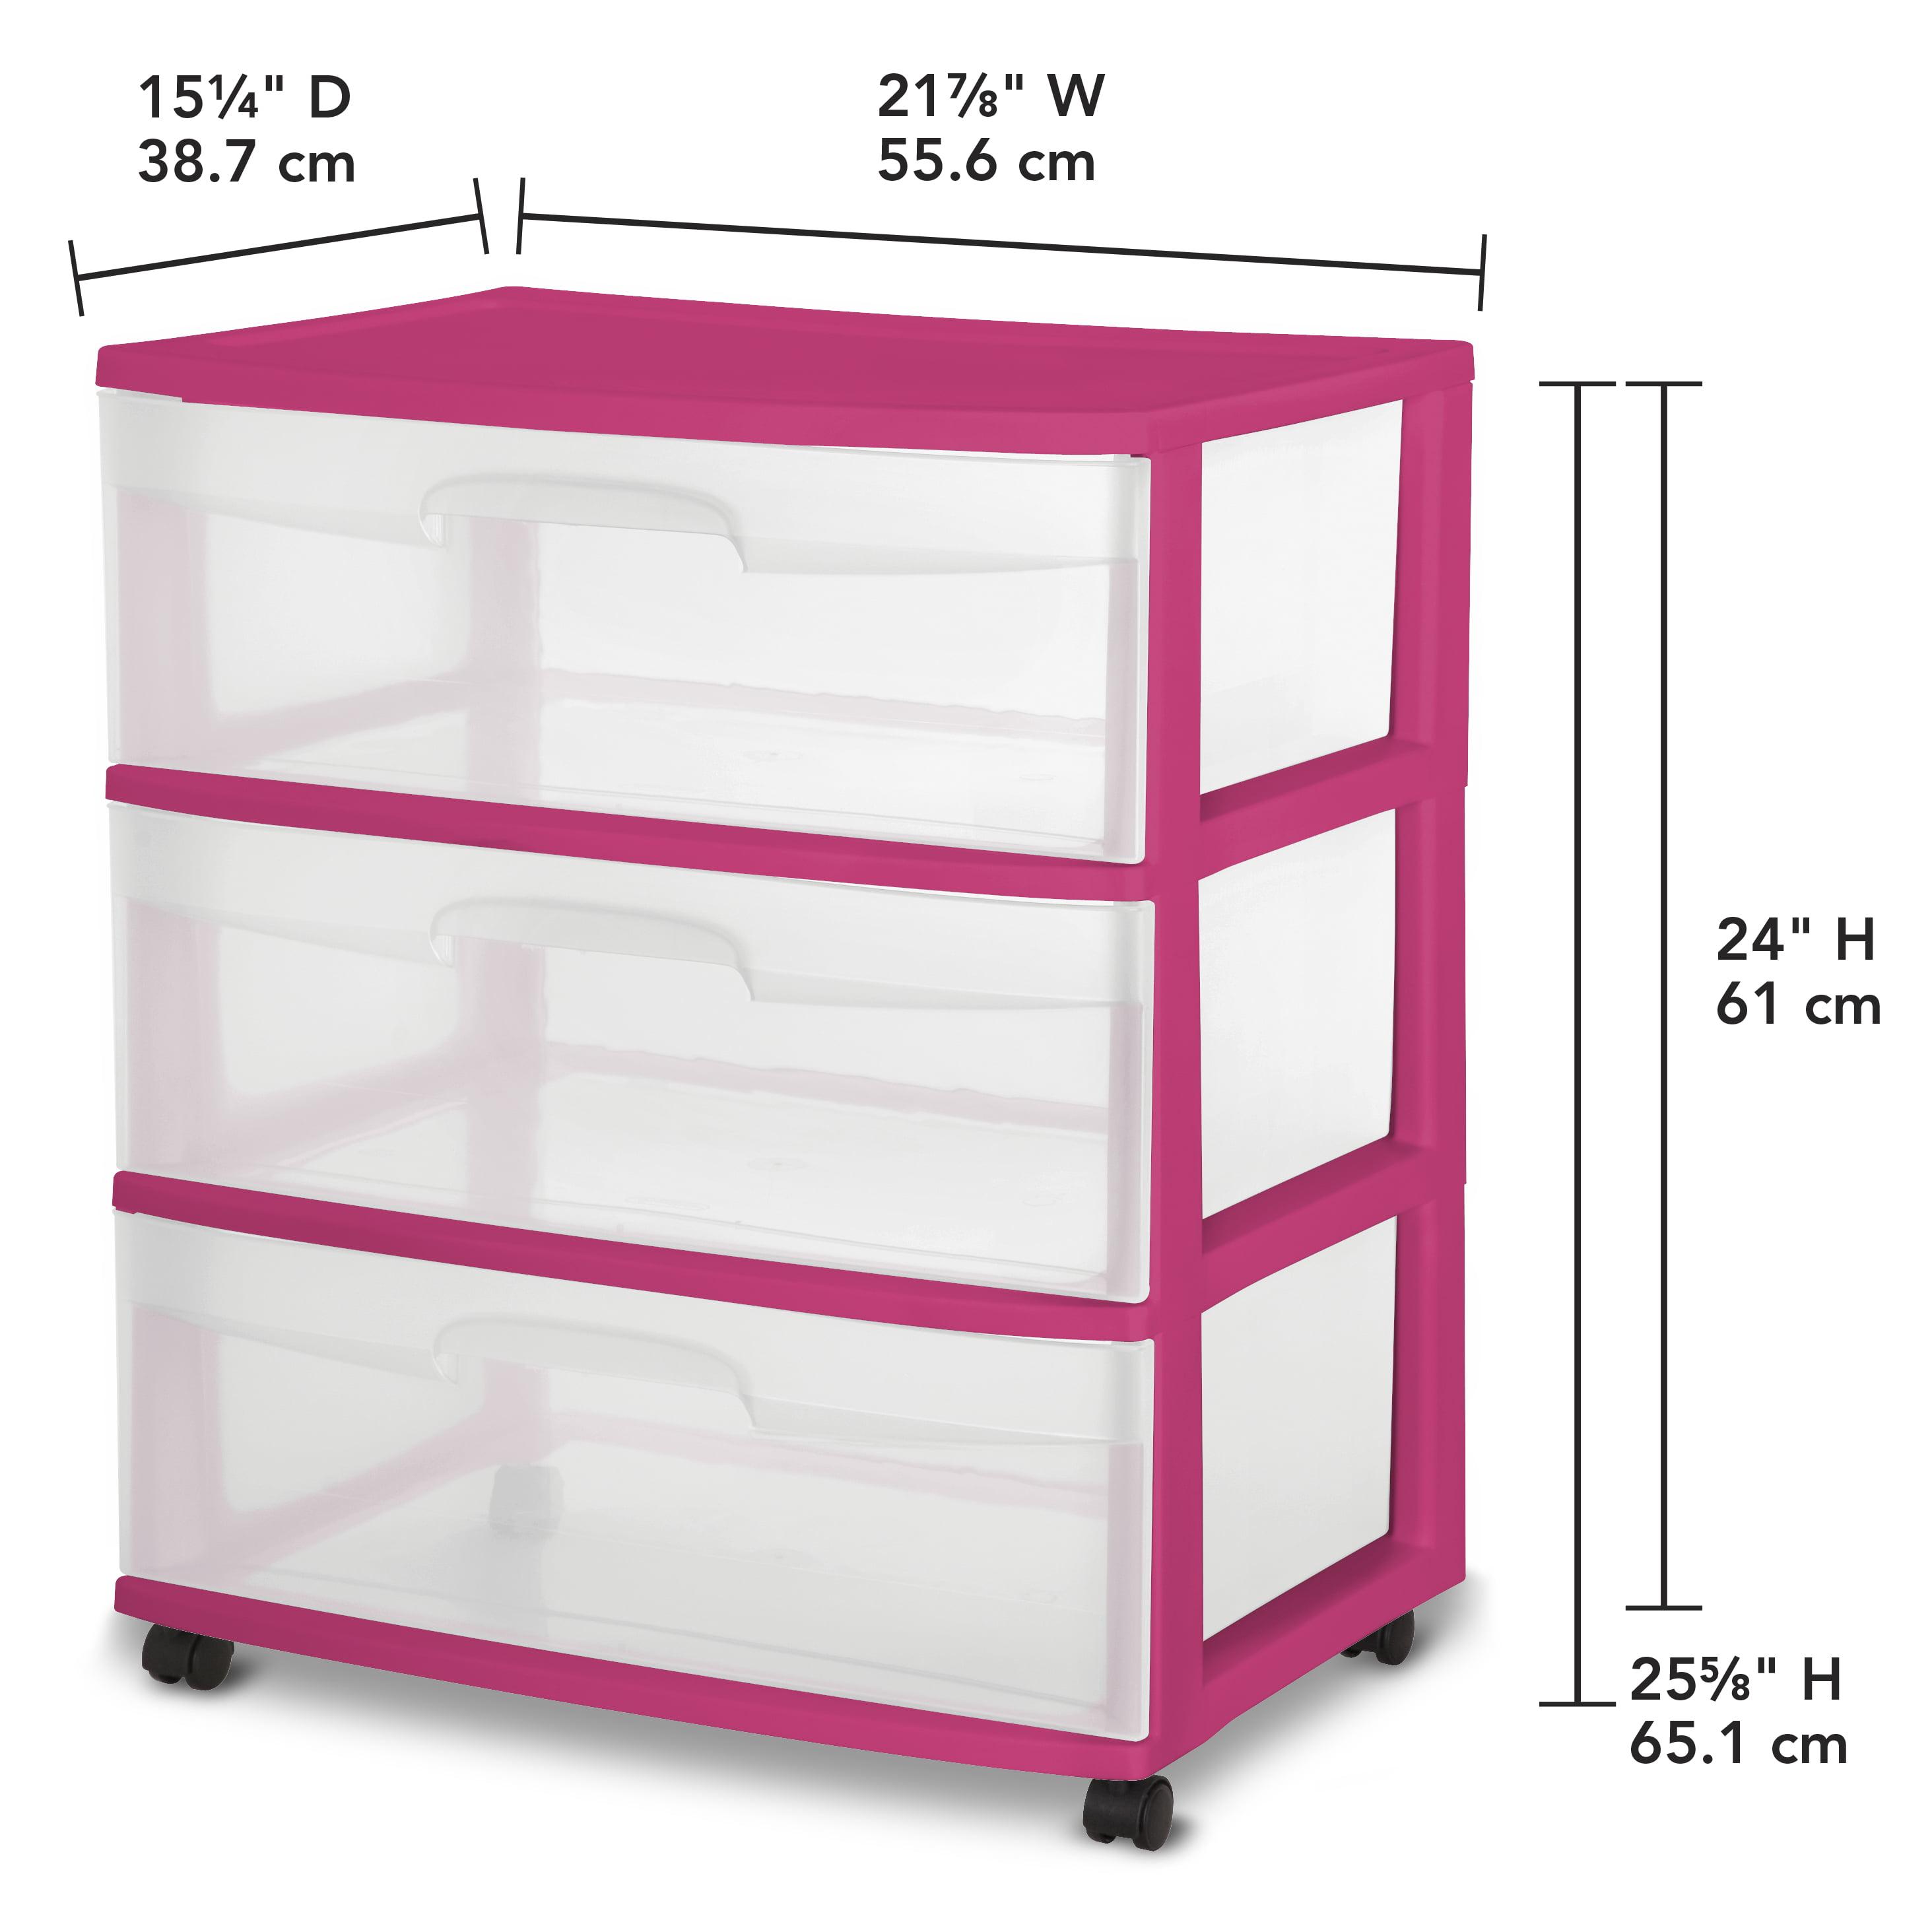 Etonnant 3 Drawer Storage Cart Organizer Rolling Home Sterilite Box Plastic Wide  Cabinet